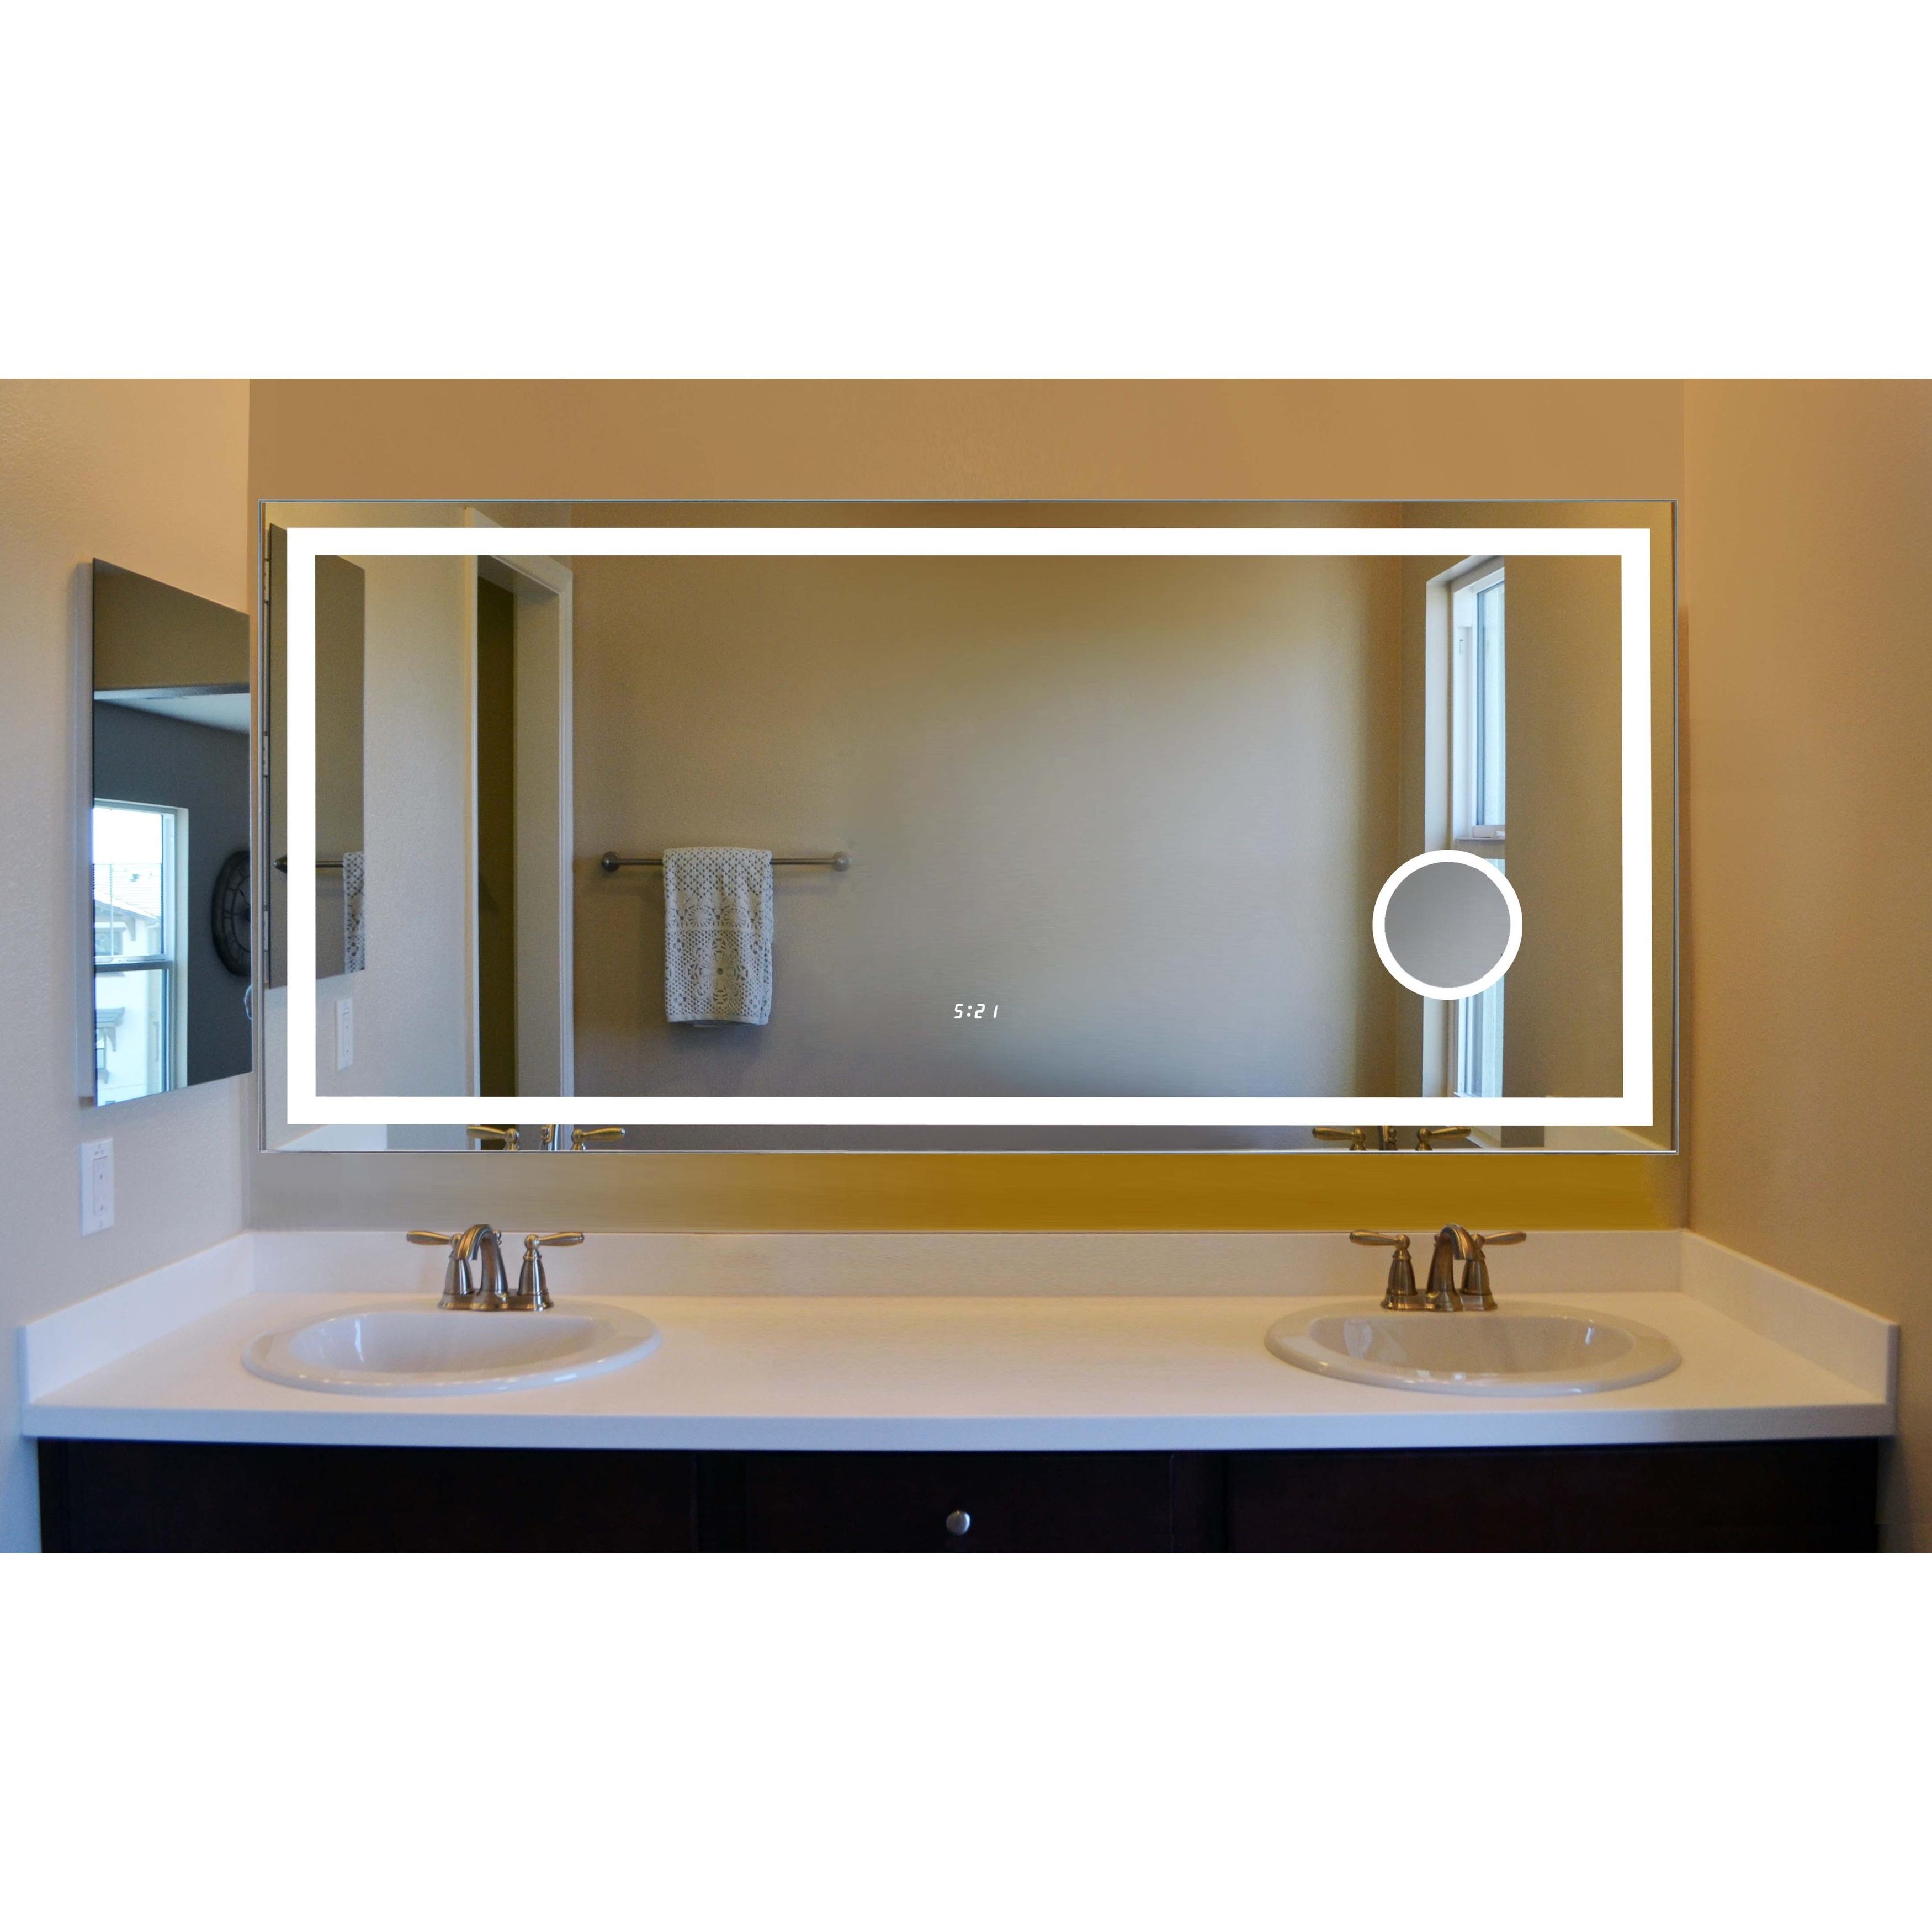 Lighted Vanity Mirror.Innoci Usa Eros Led Wall Mount Lighted Vanity Mirror Featuring Built In Led Cosmetic Mirror Digital Display Clock Ir Sensor